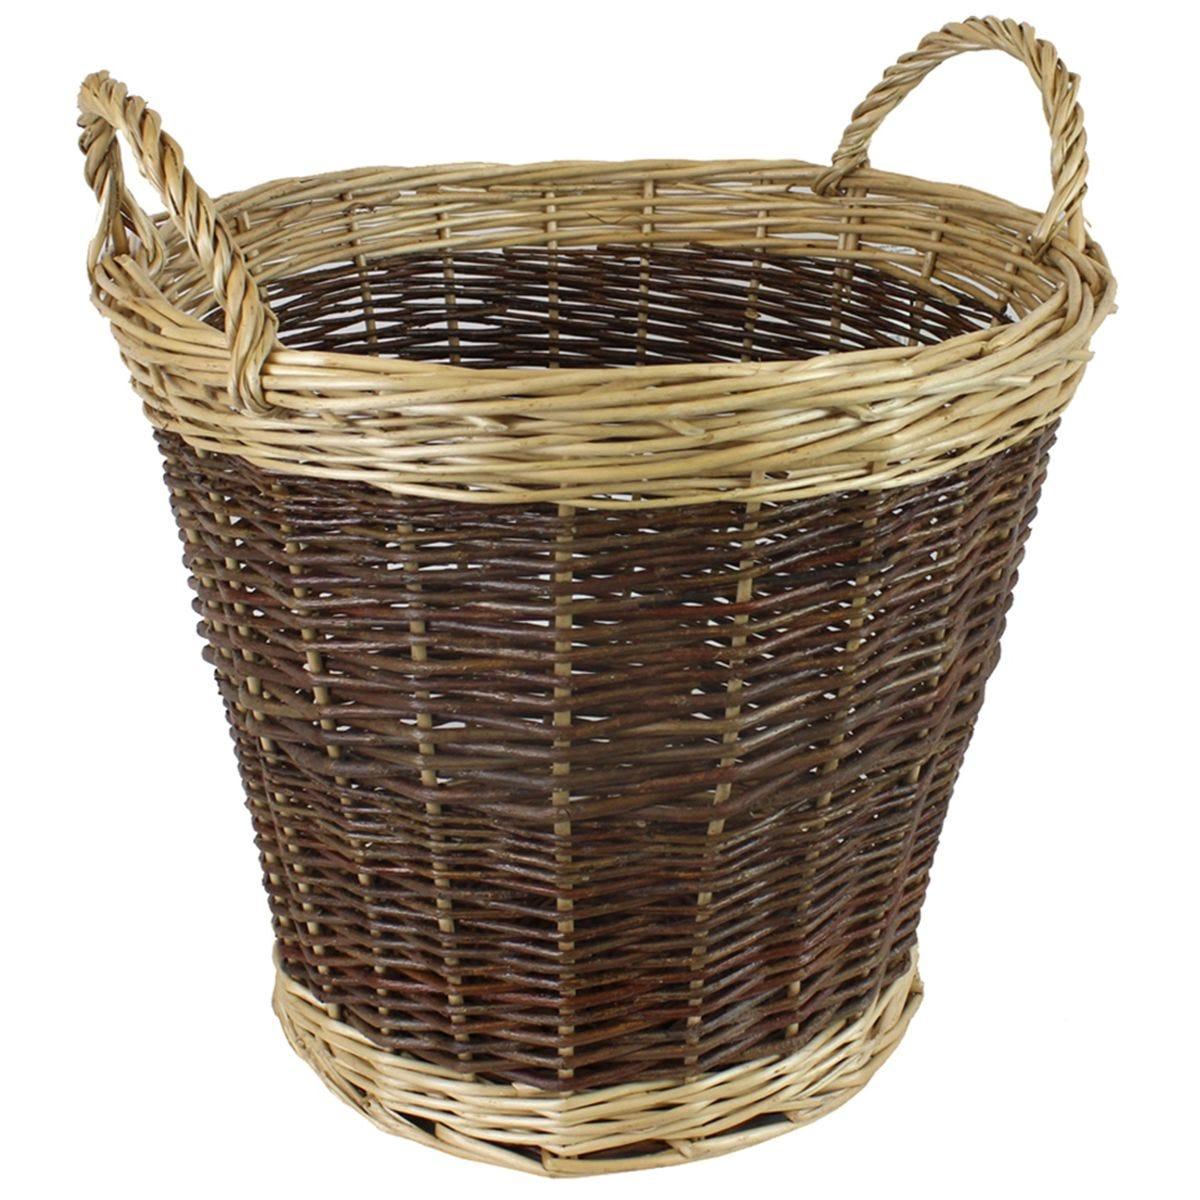 JVL Two Tone Willow Log Basket 60 x 50 cm